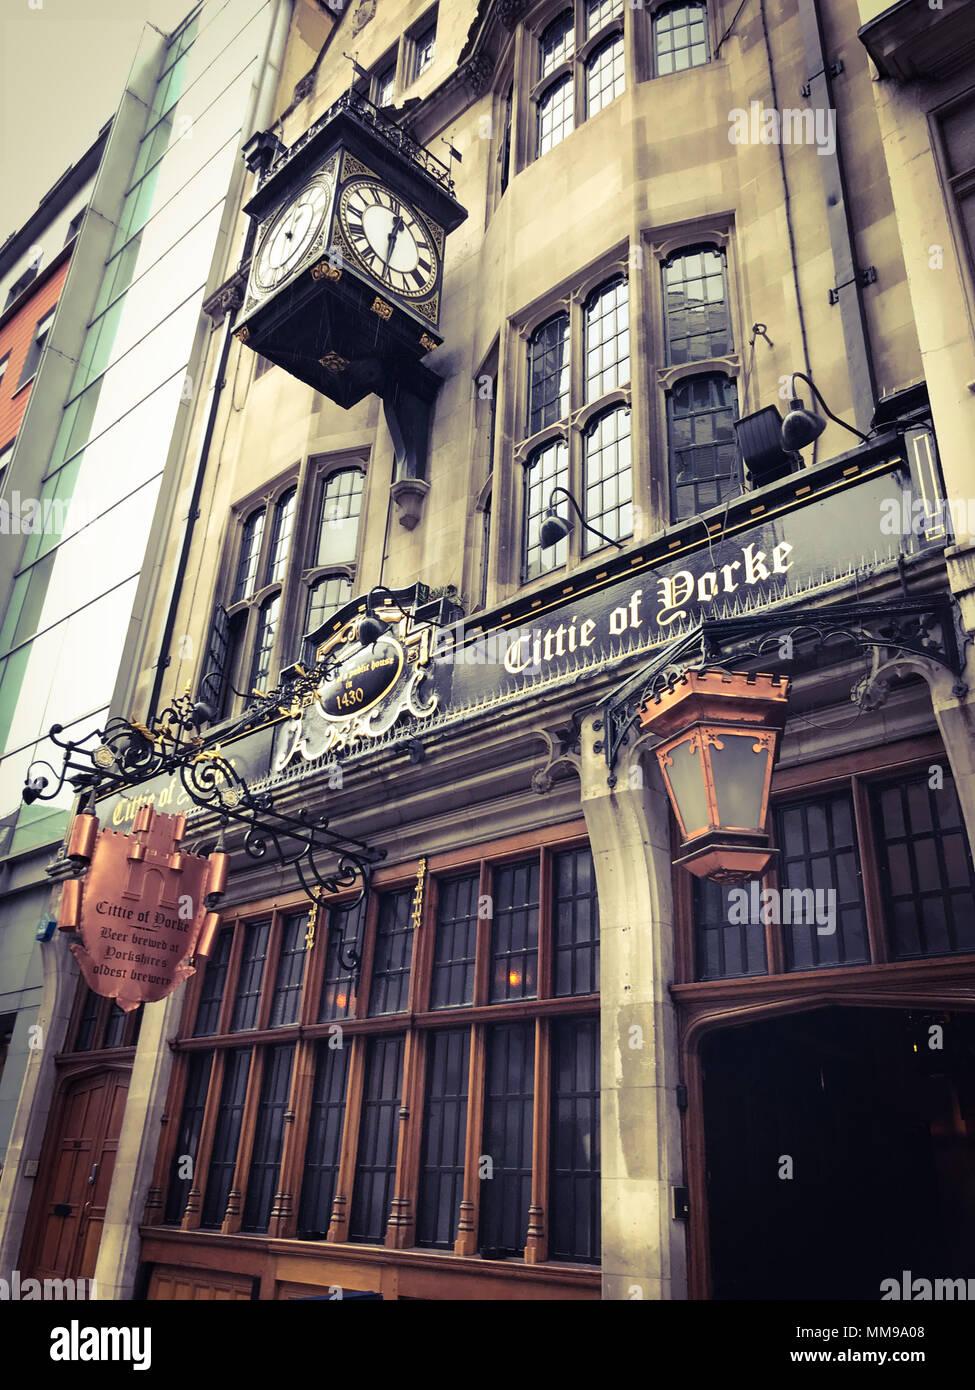 Citte Of Yorke Pub, Chancelry Lane, Holborn, London, England, UK Stock Photo